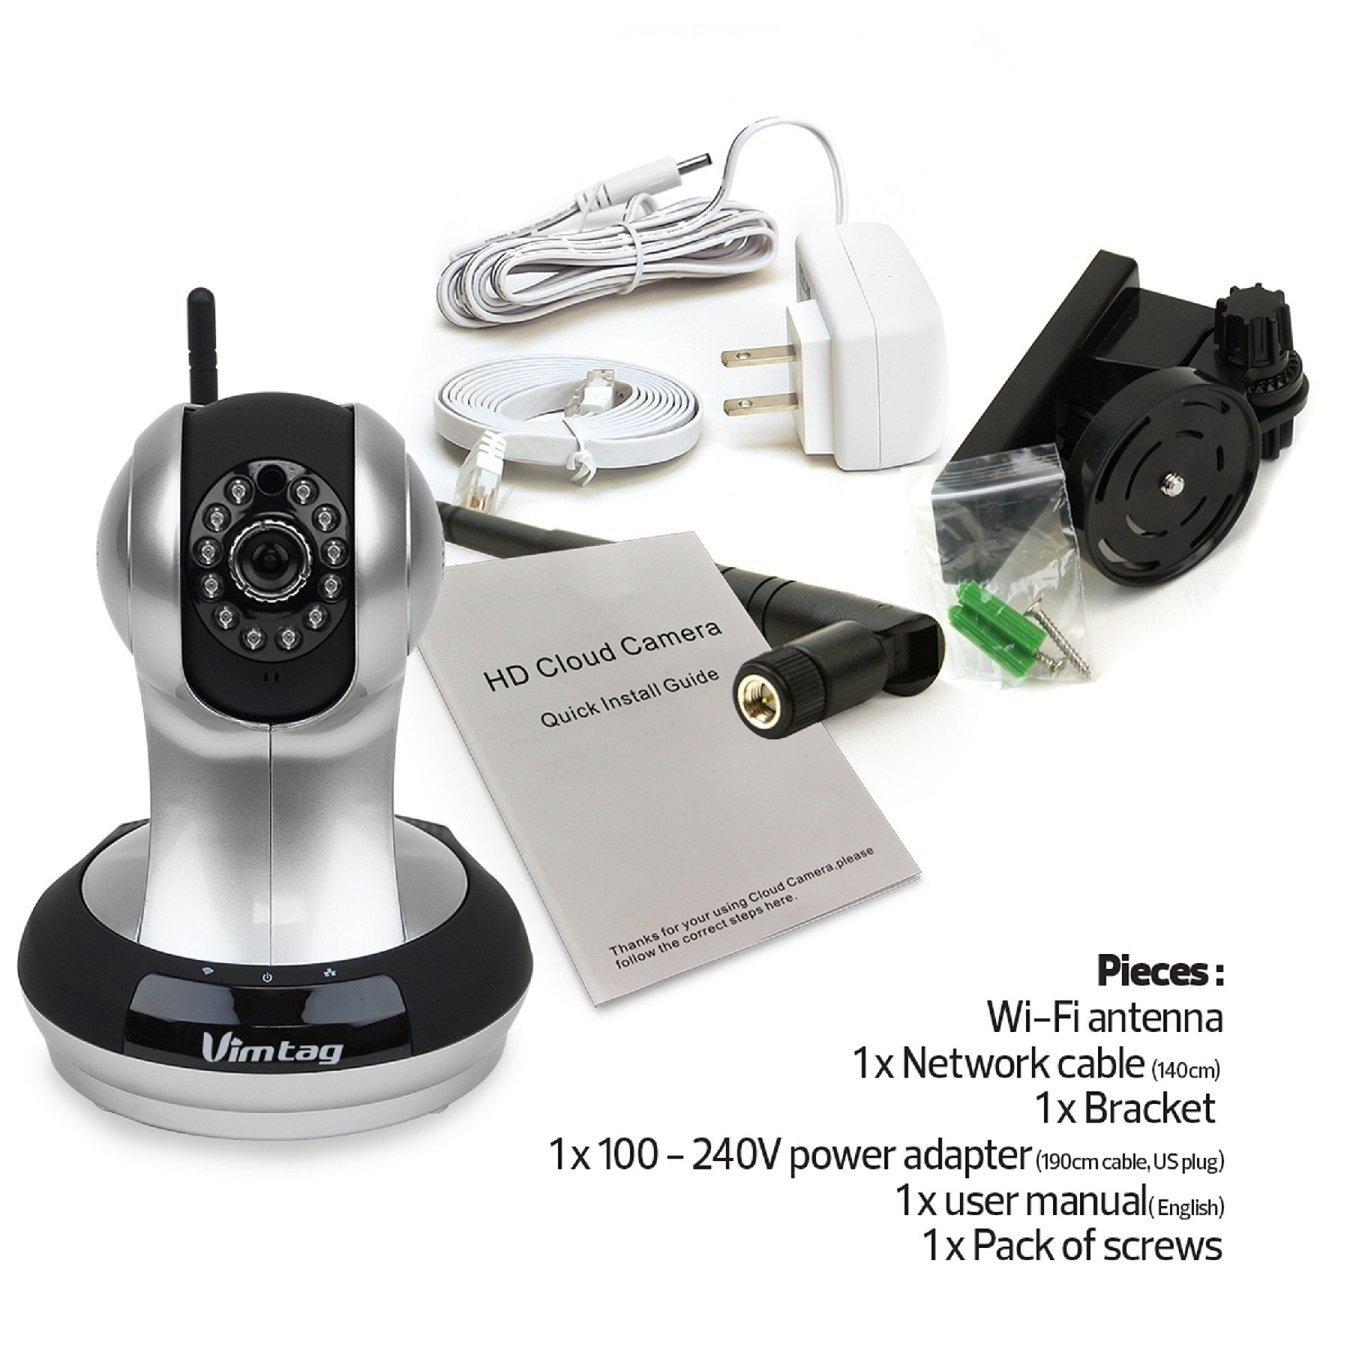 Vimtag VT-361 Super HD WiFi Video Monitoring Surveillance Security Camera